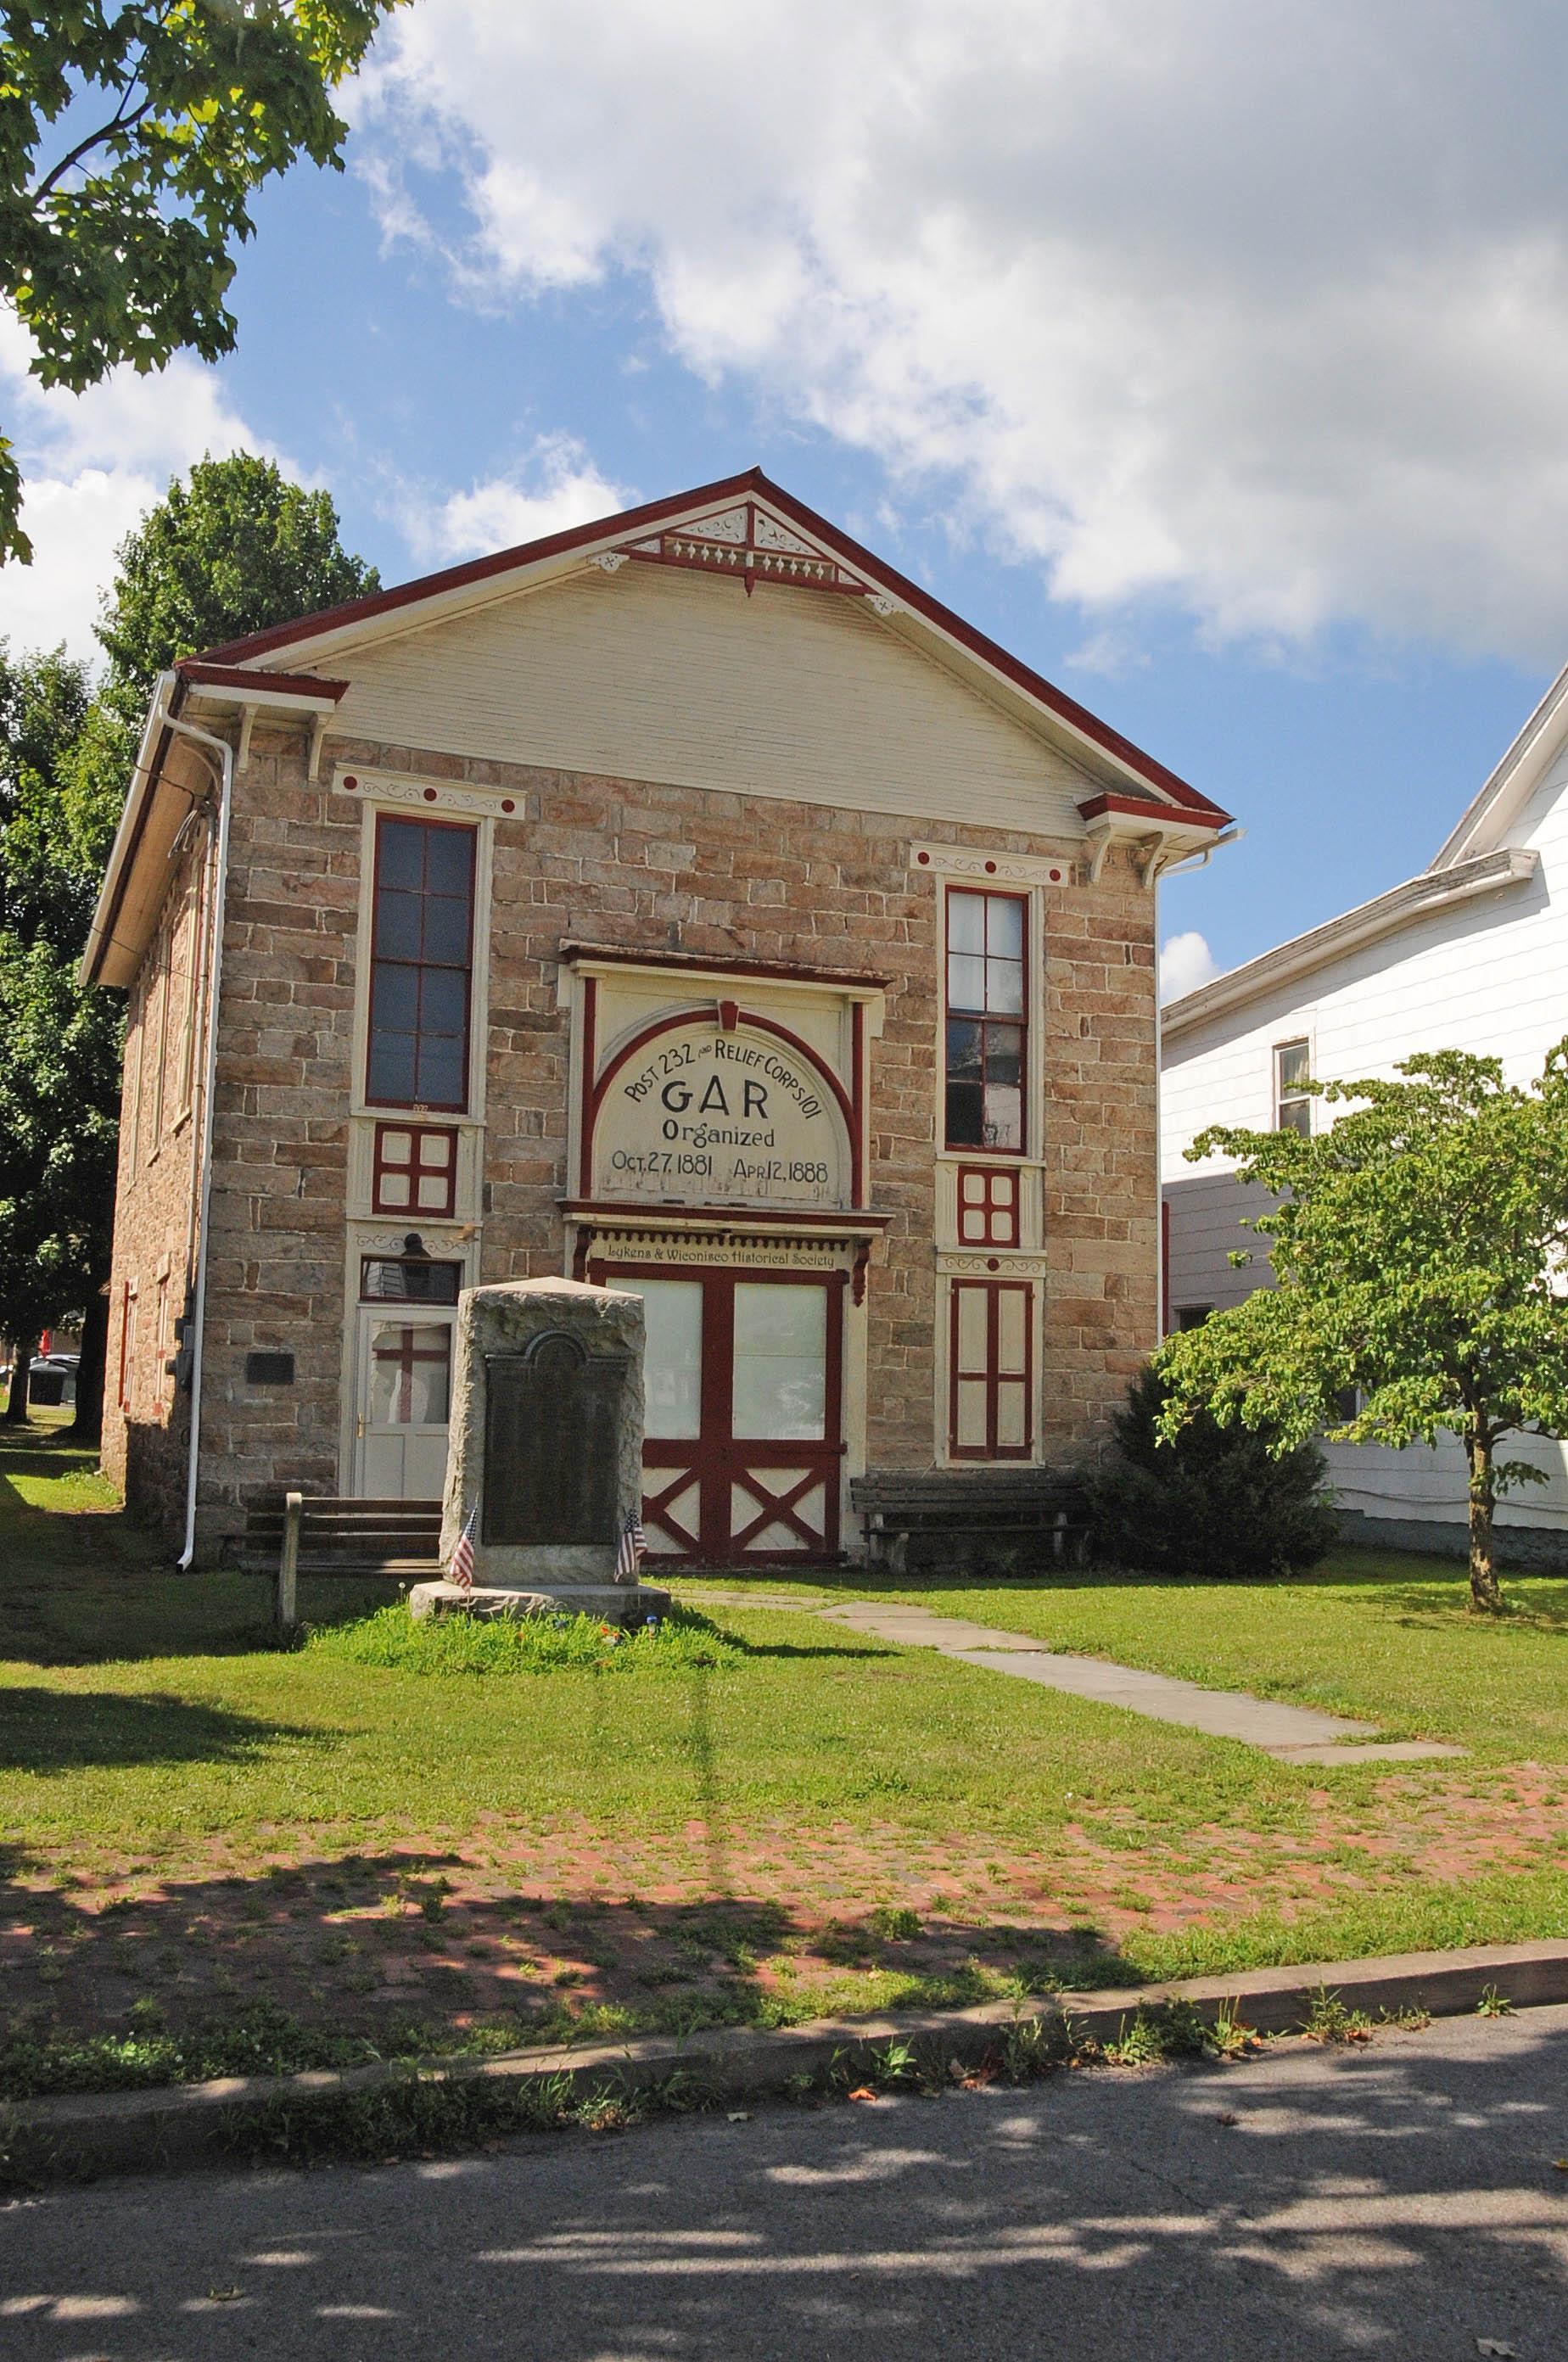 GAR_BUILDING%2C_LYKENS%2C_DAUPHIN_COUNTY%2C_PA Mathway Similar Px Conrad And Margaret Ellerman House Dauphin County Pa Qoq Wyg on